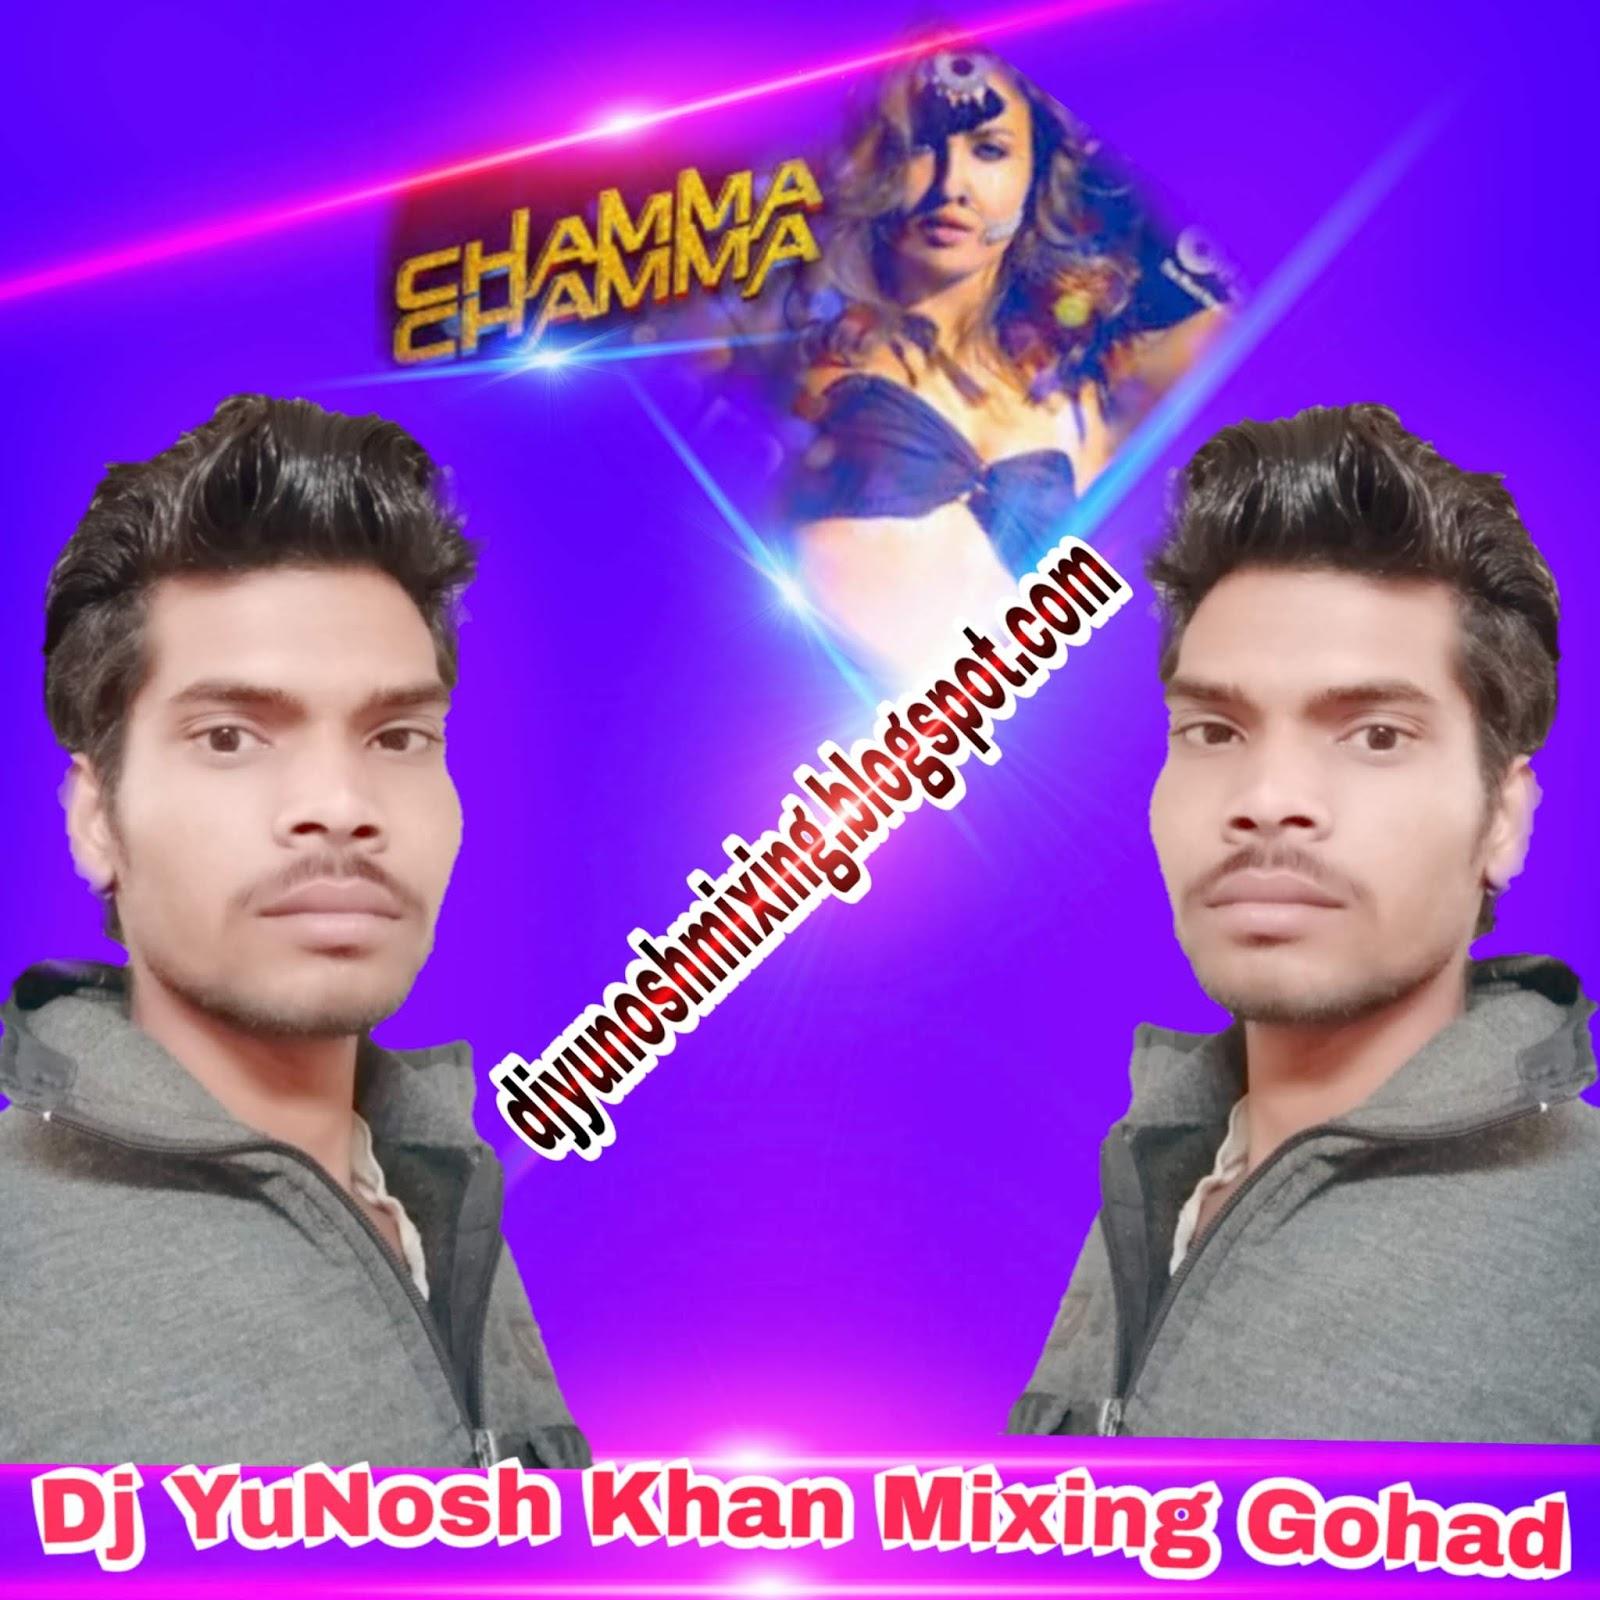 Dj Yunosh Khan Mixing